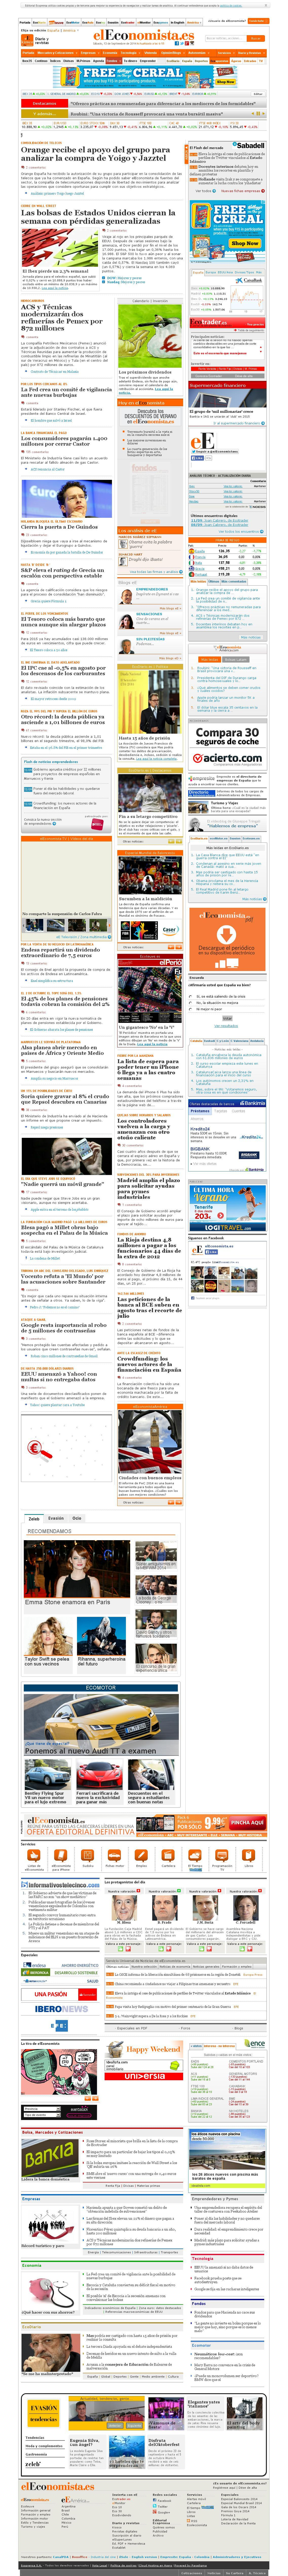 elEconomista at Saturday Sept. 13, 2014, 5:04 a.m. UTC